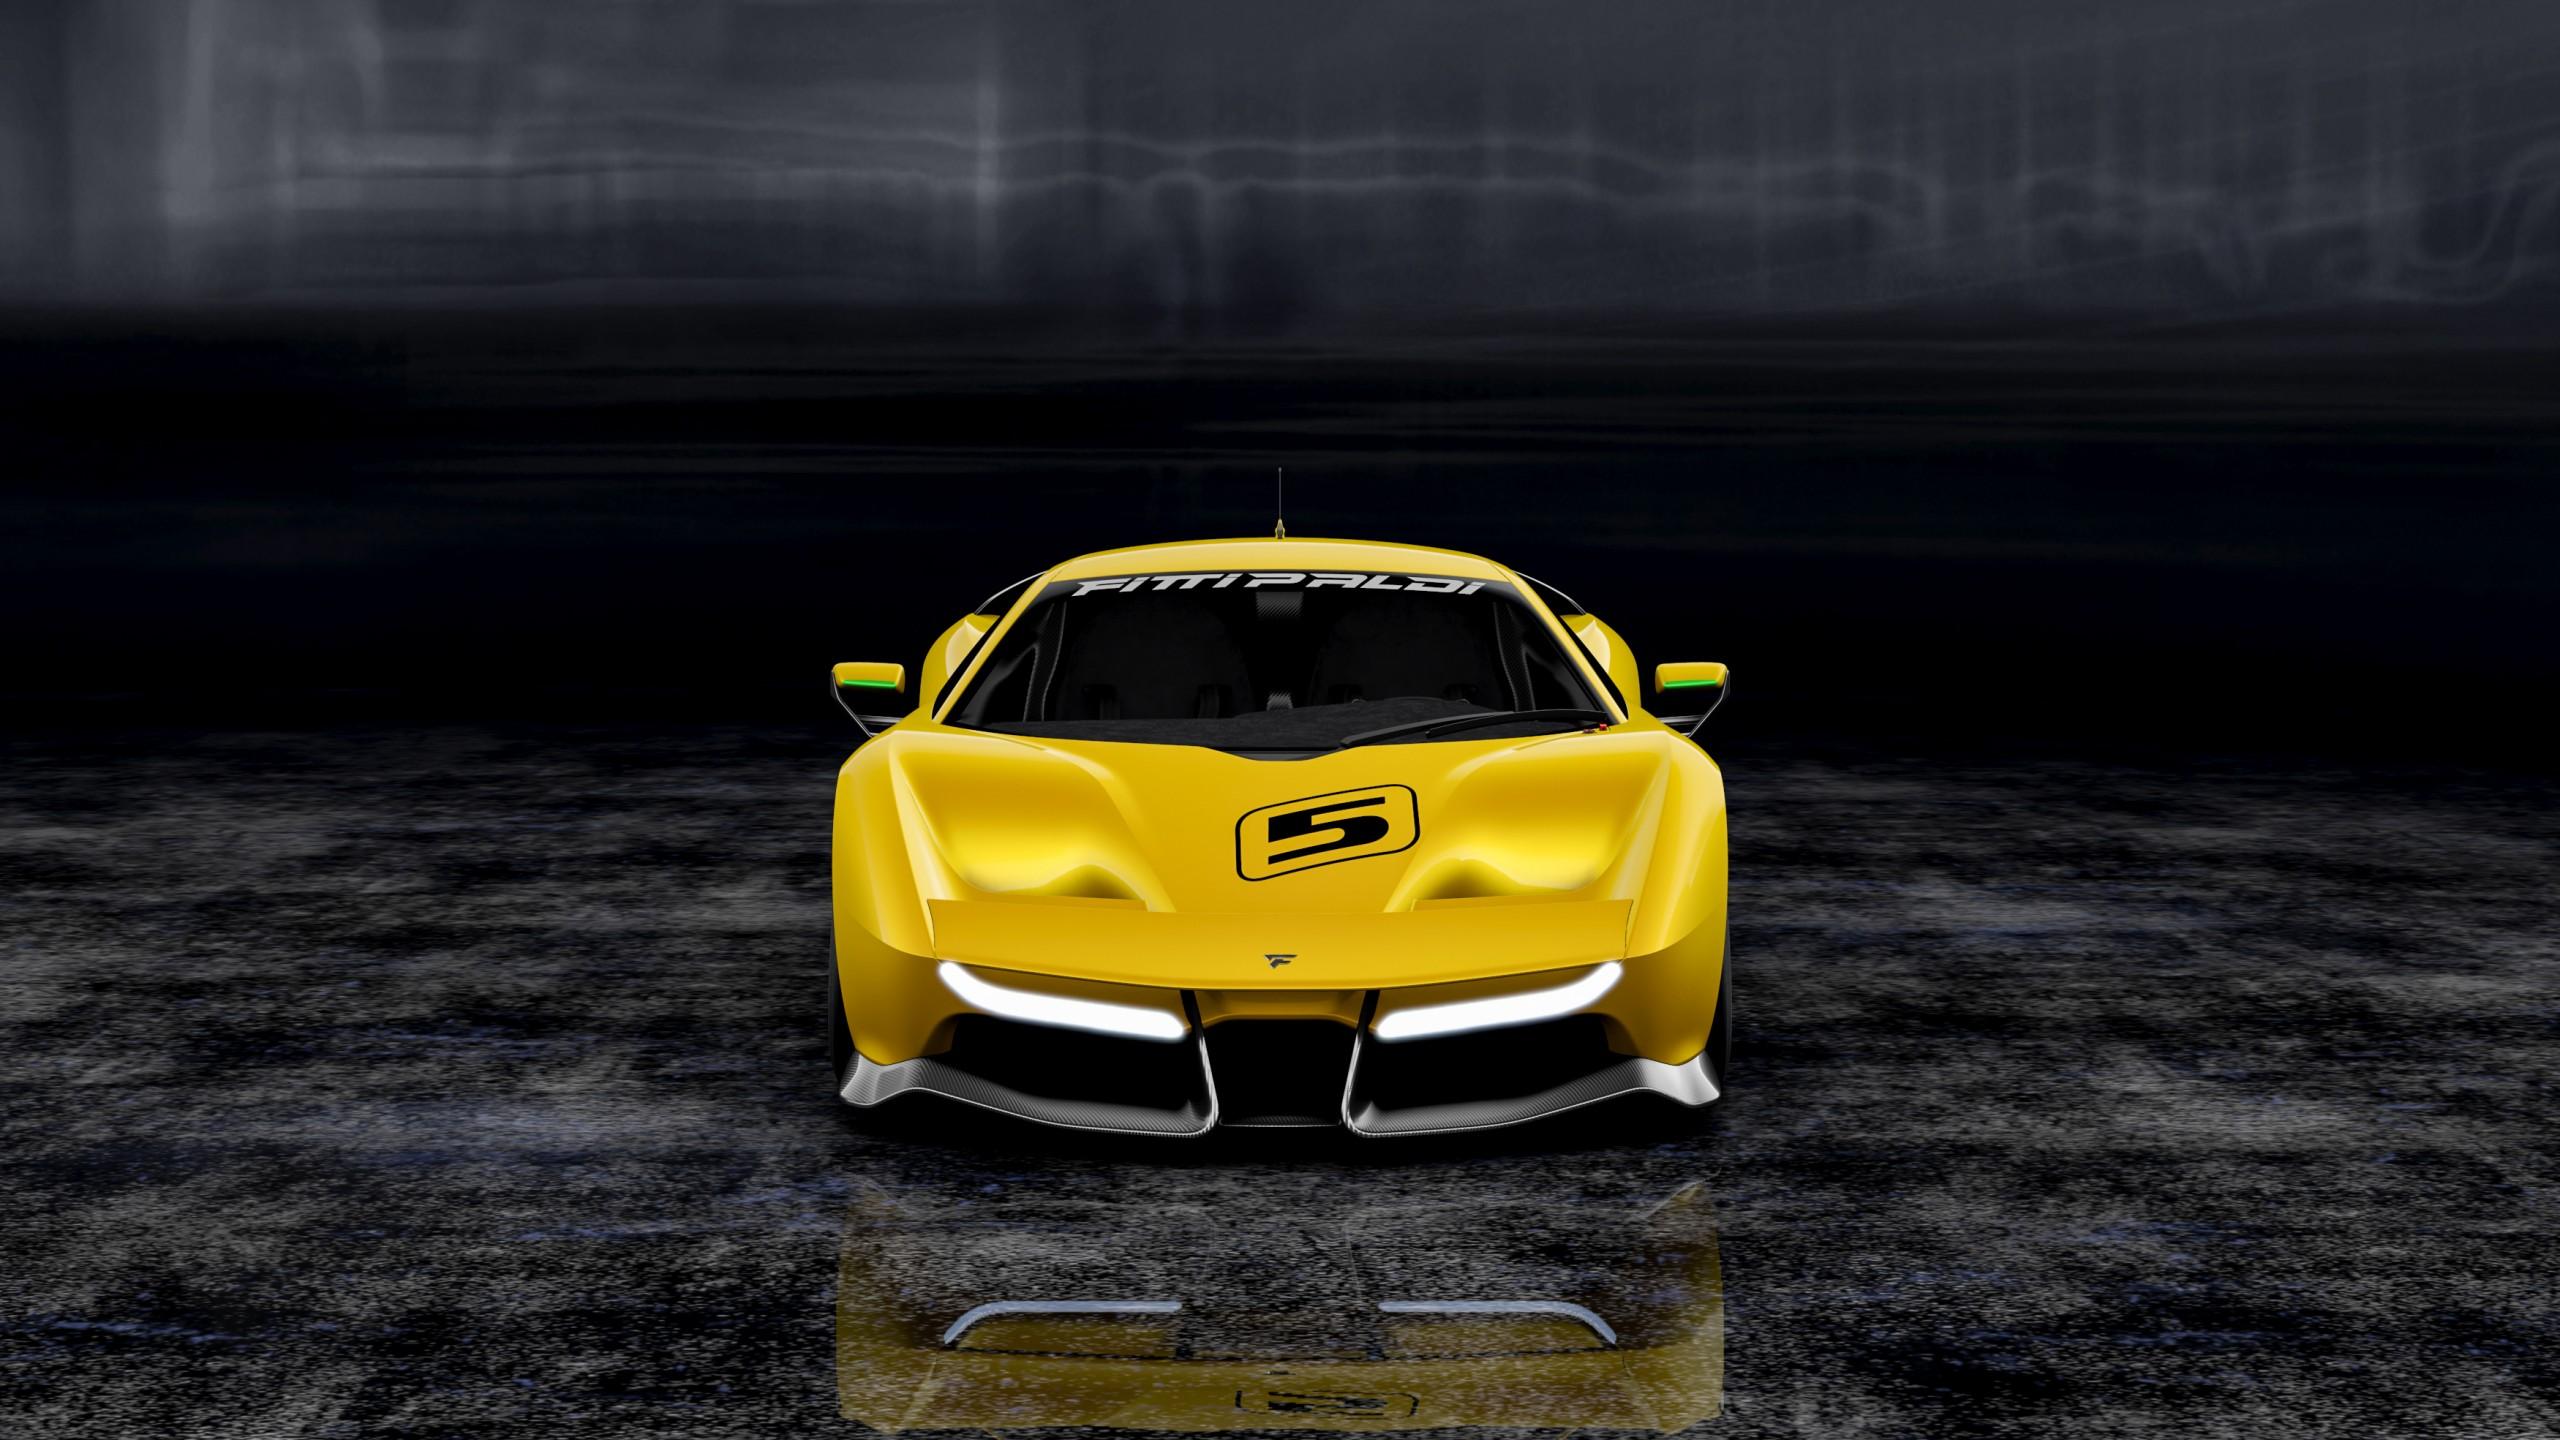 Carbon Wallpaper Iphone X 2017 Fittipaldi Ef7 Vision Gran Turismo 2 Wallpaper Hd